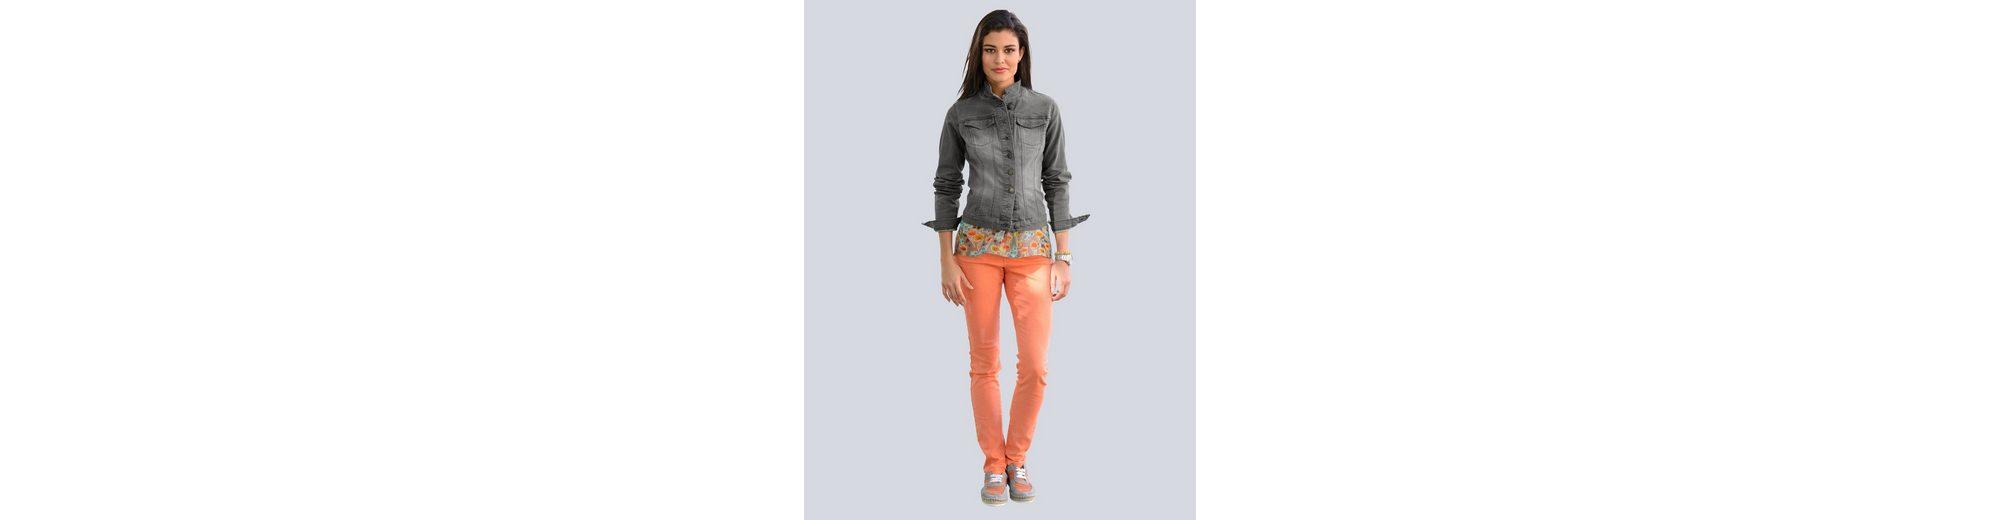 Alba Moda Jeans in Röhrenform Rabatt Vermarktbare Online Zahlen Mit Paypal Verkauf Rabatt Geniue Händler PFP6YY43